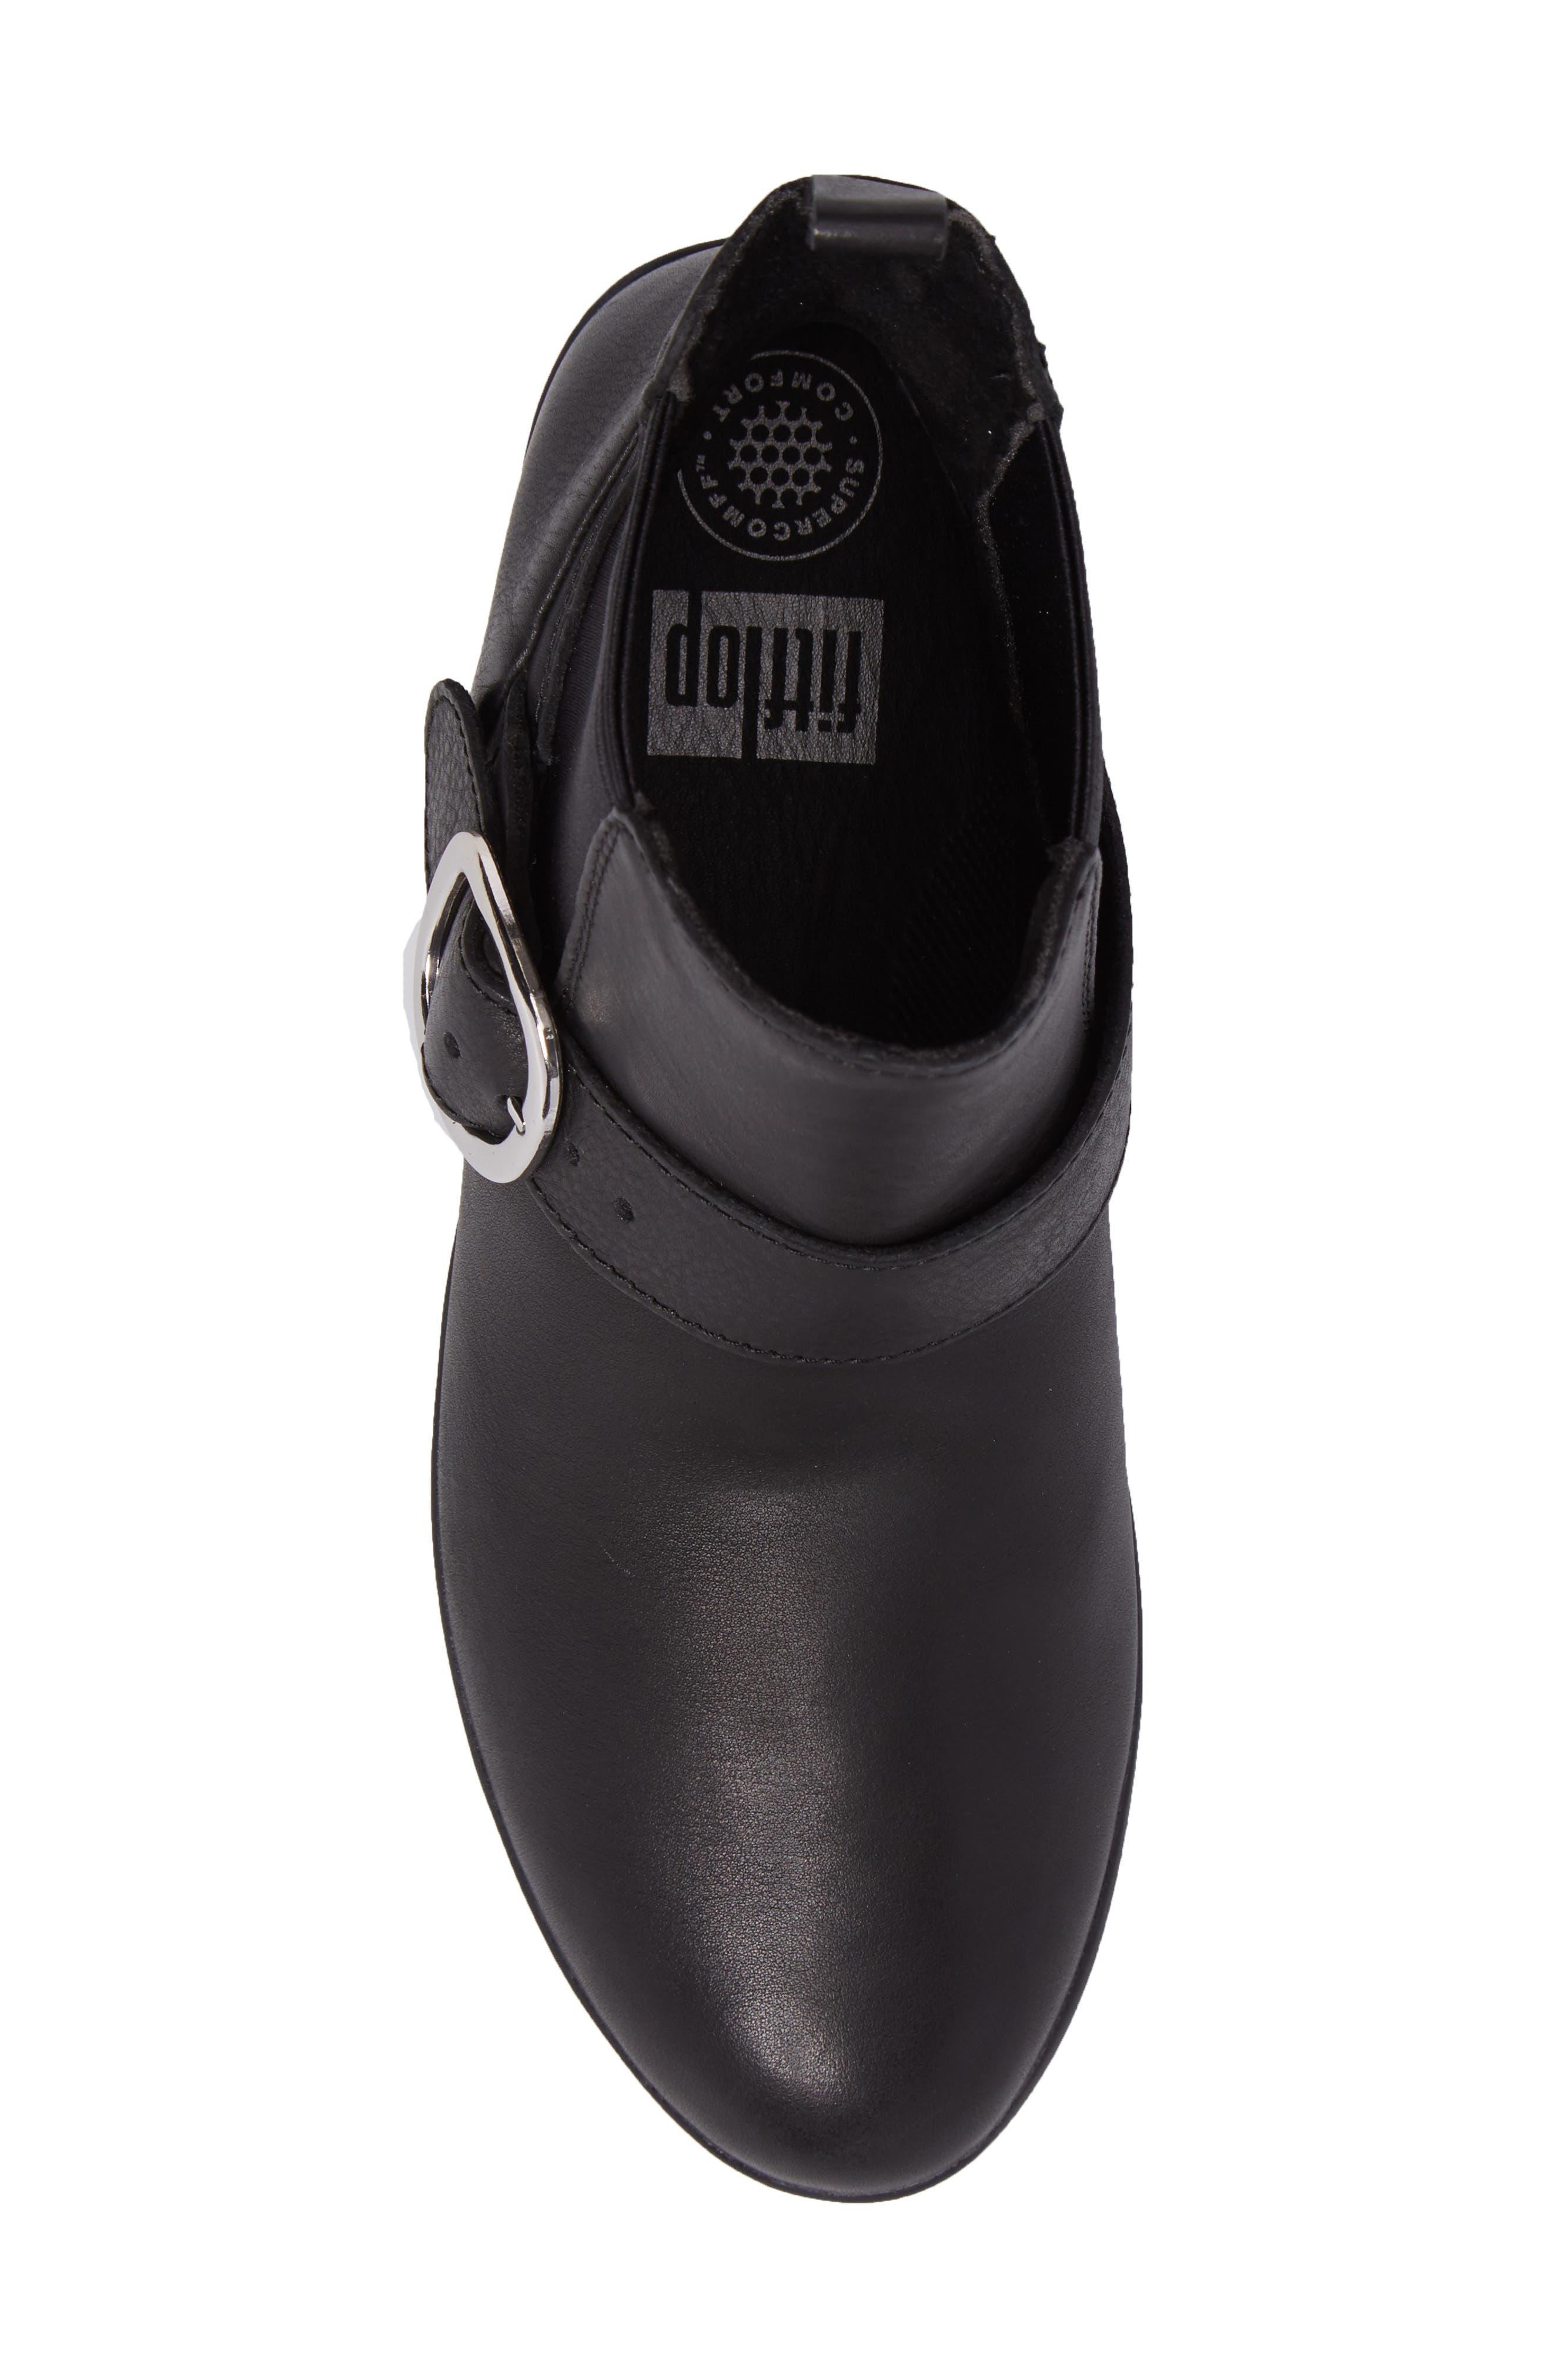 Superbuckle Chelsea Boot,                             Alternate thumbnail 5, color,                             Black